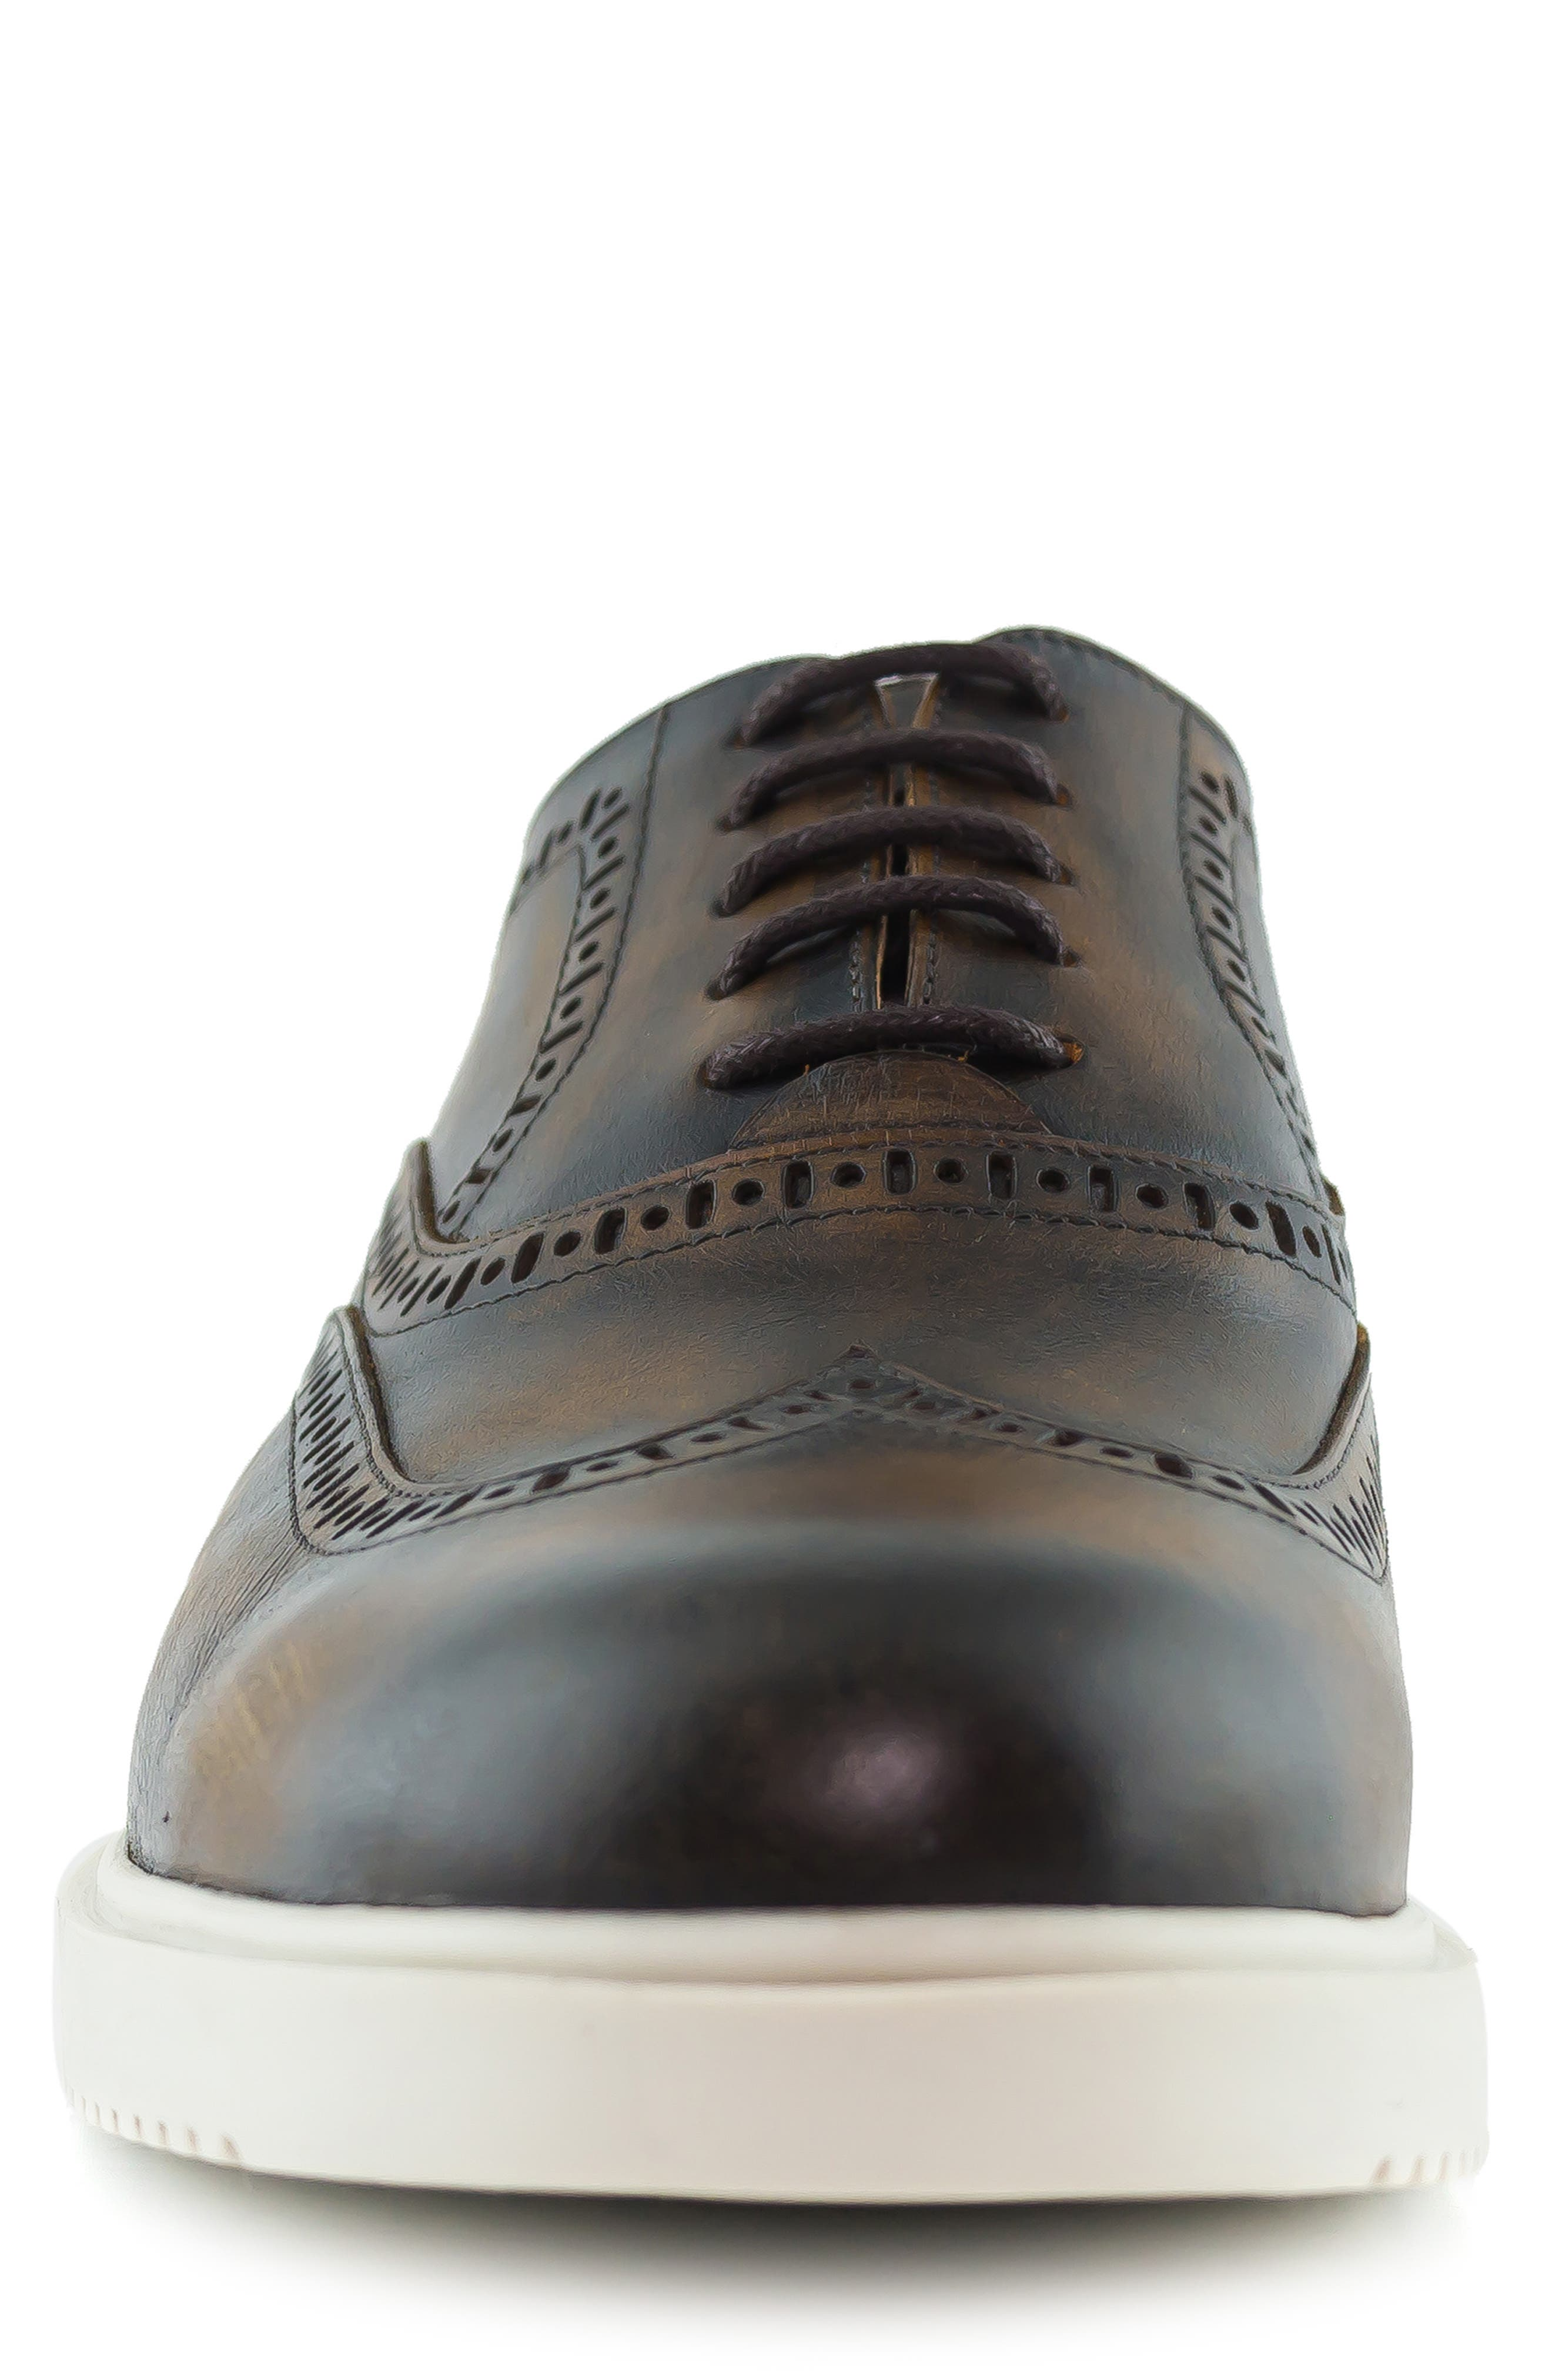 5th Ave Wingtip Sneaker,                             Alternate thumbnail 16, color,